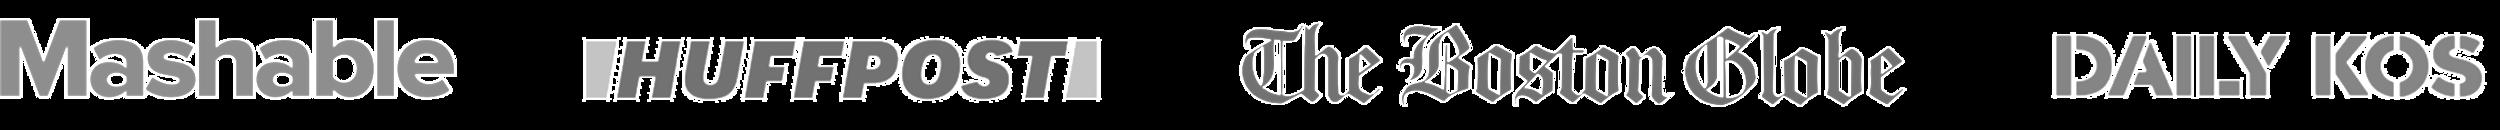 Media Logos (All).png